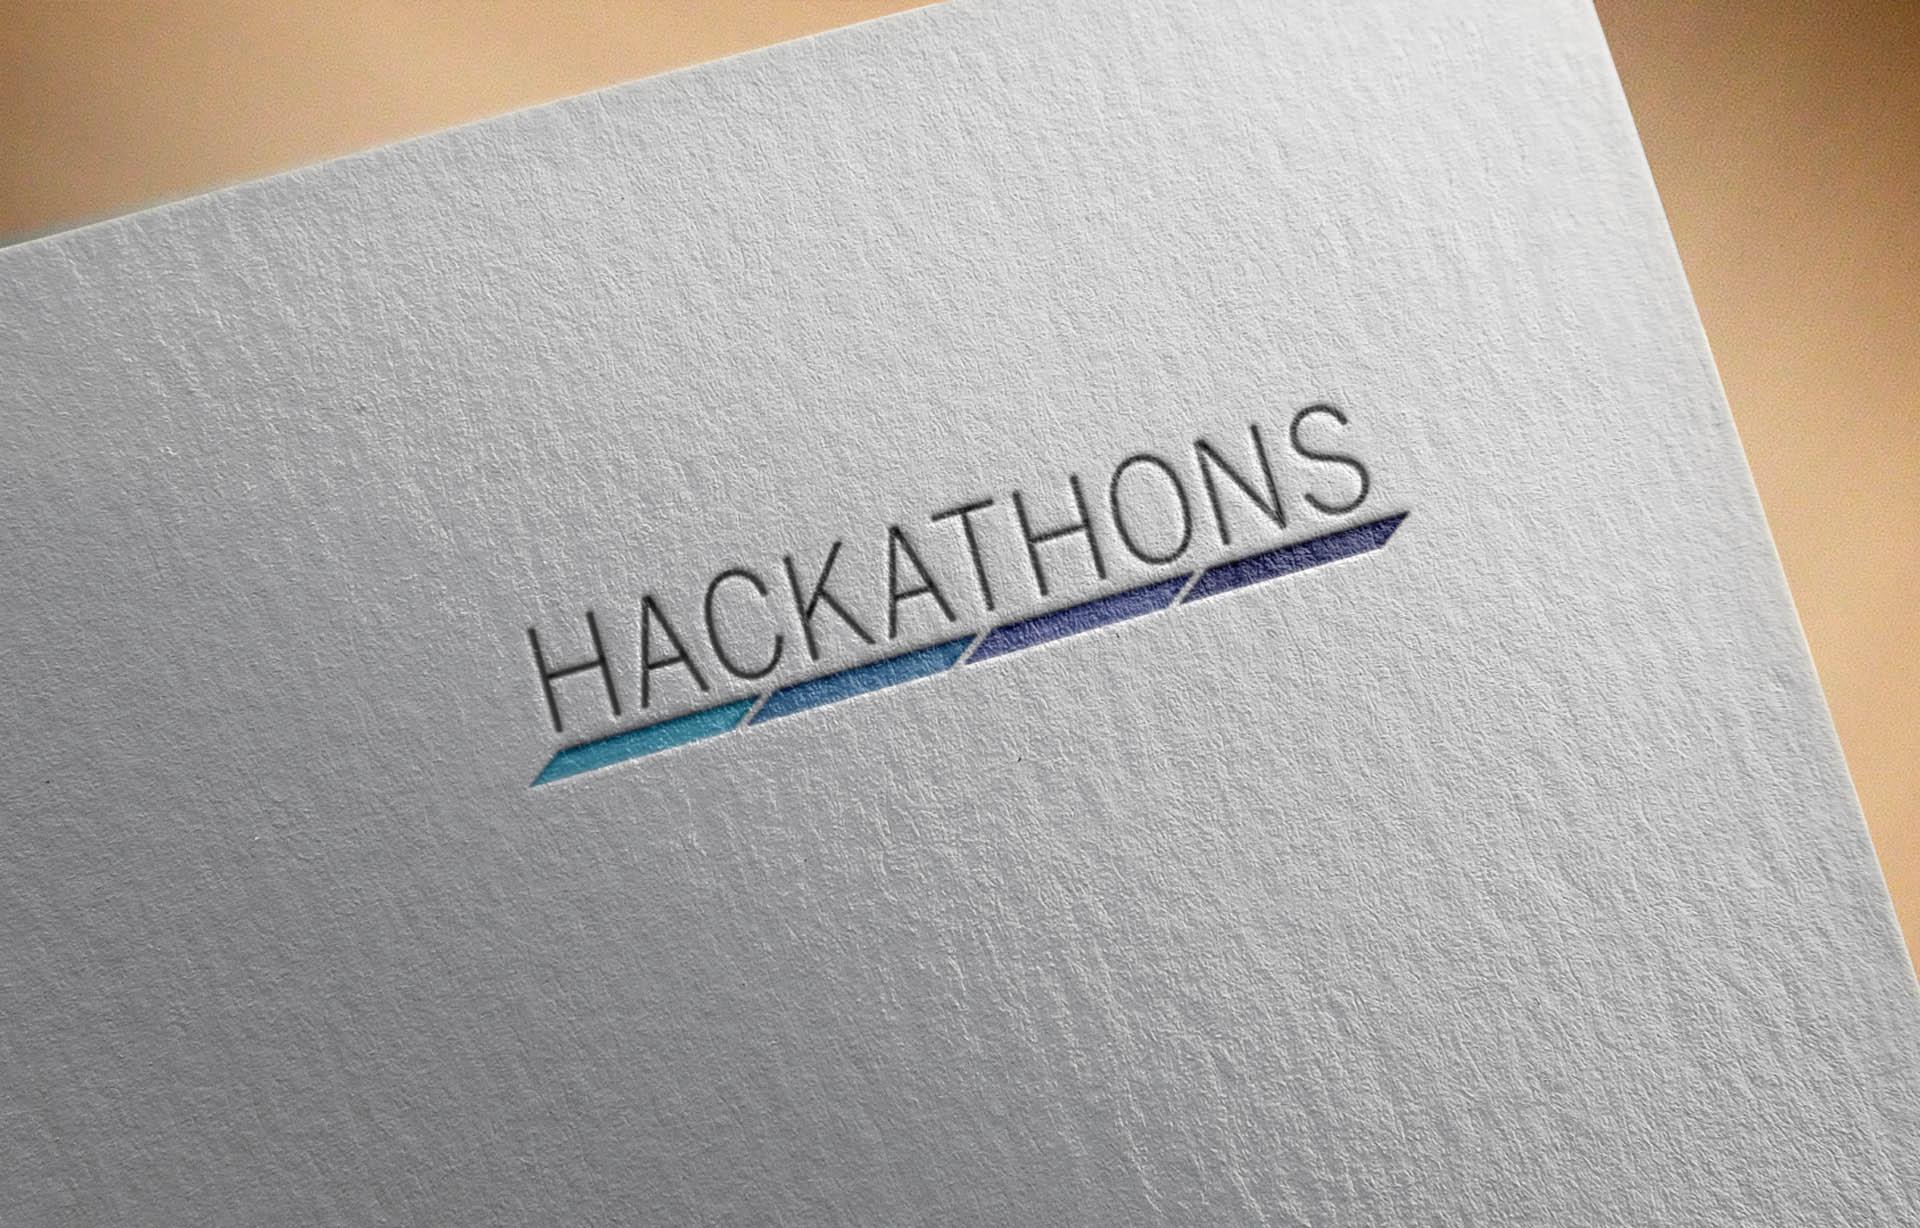 Adatto.cz, tvorba loga - Hackathons